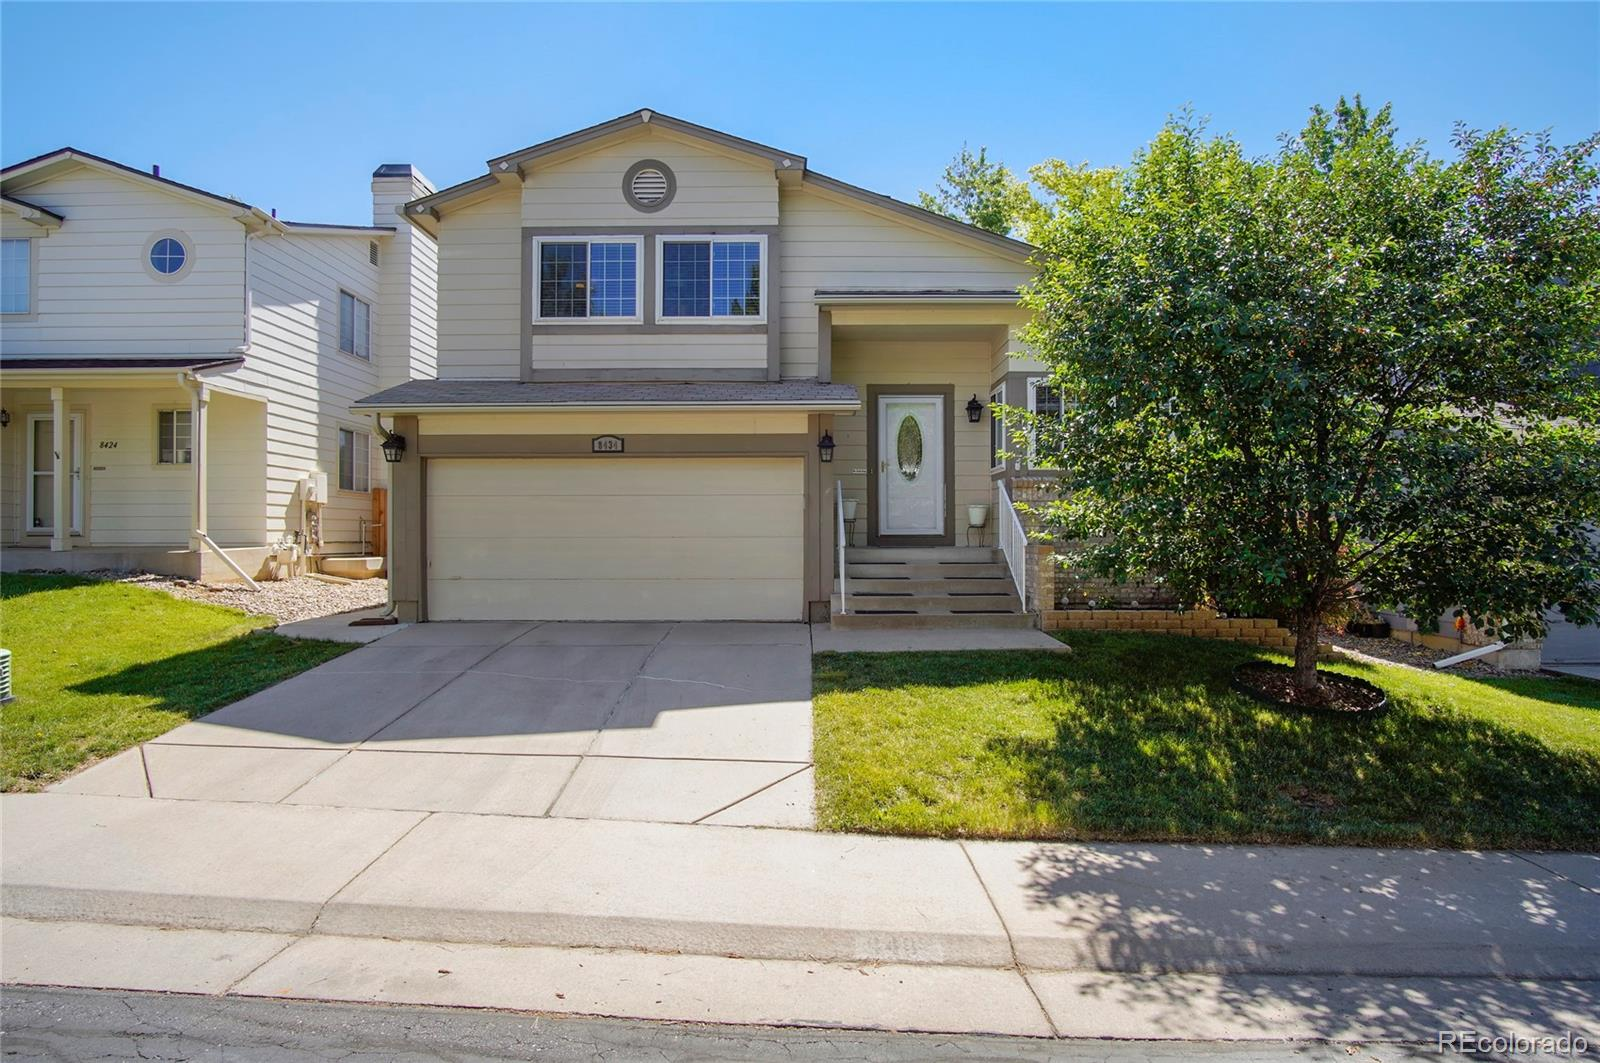 8434 S Upham Way Property Photo - Littleton, CO real estate listing